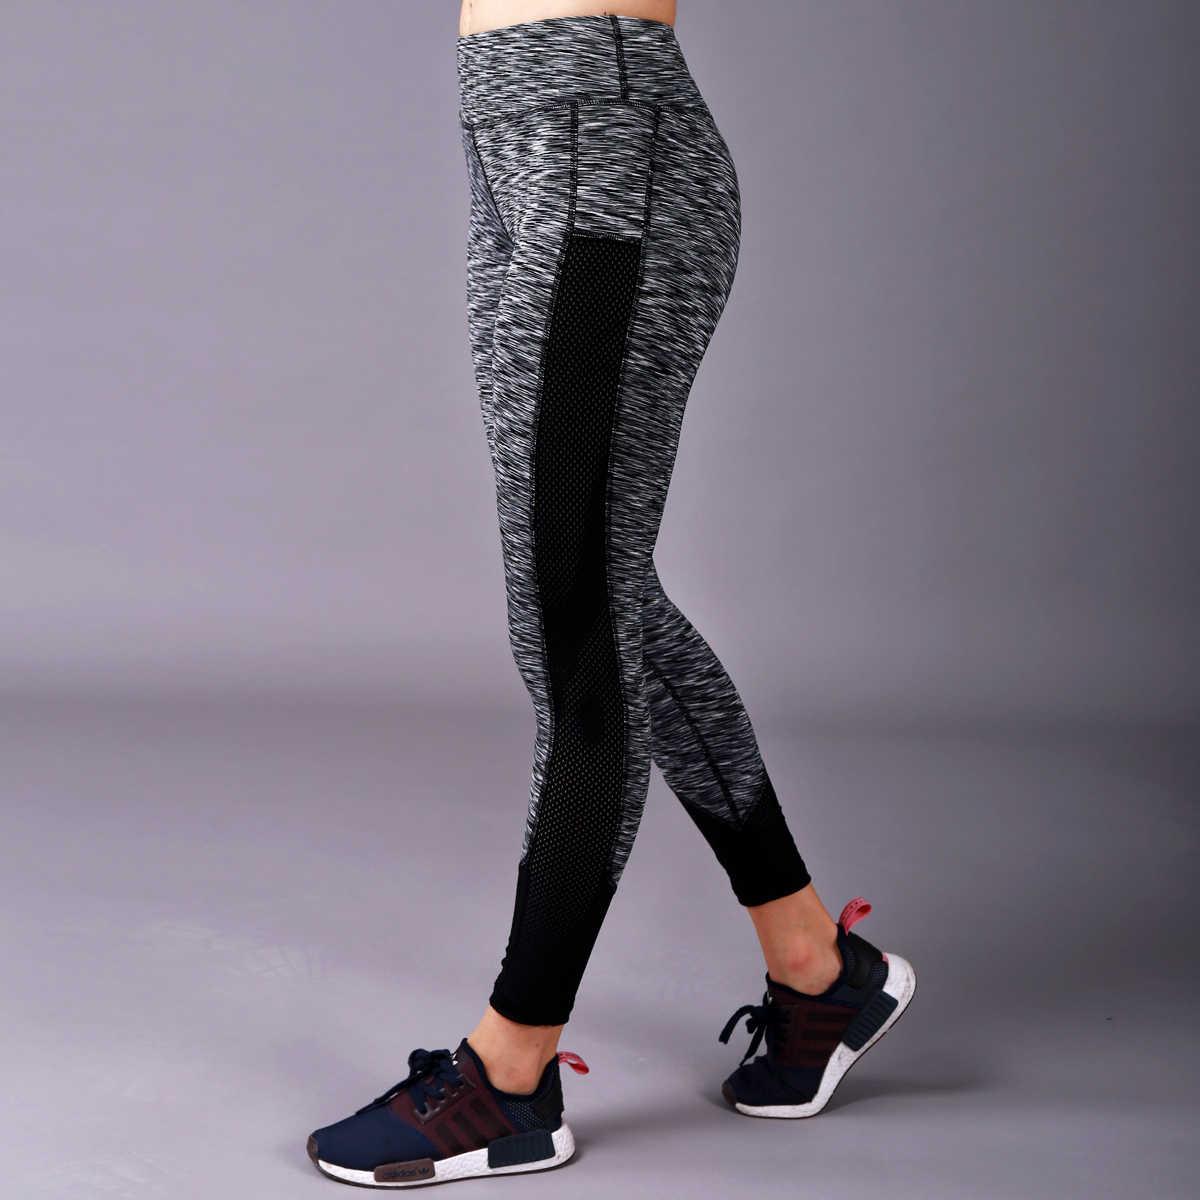 BARBOK נשים של יוגה חותלות Ultralight ריצה ספורט לנשימה ספורט ללבוש כושר חדר כושר אימון אימון ריצה מכנסיים